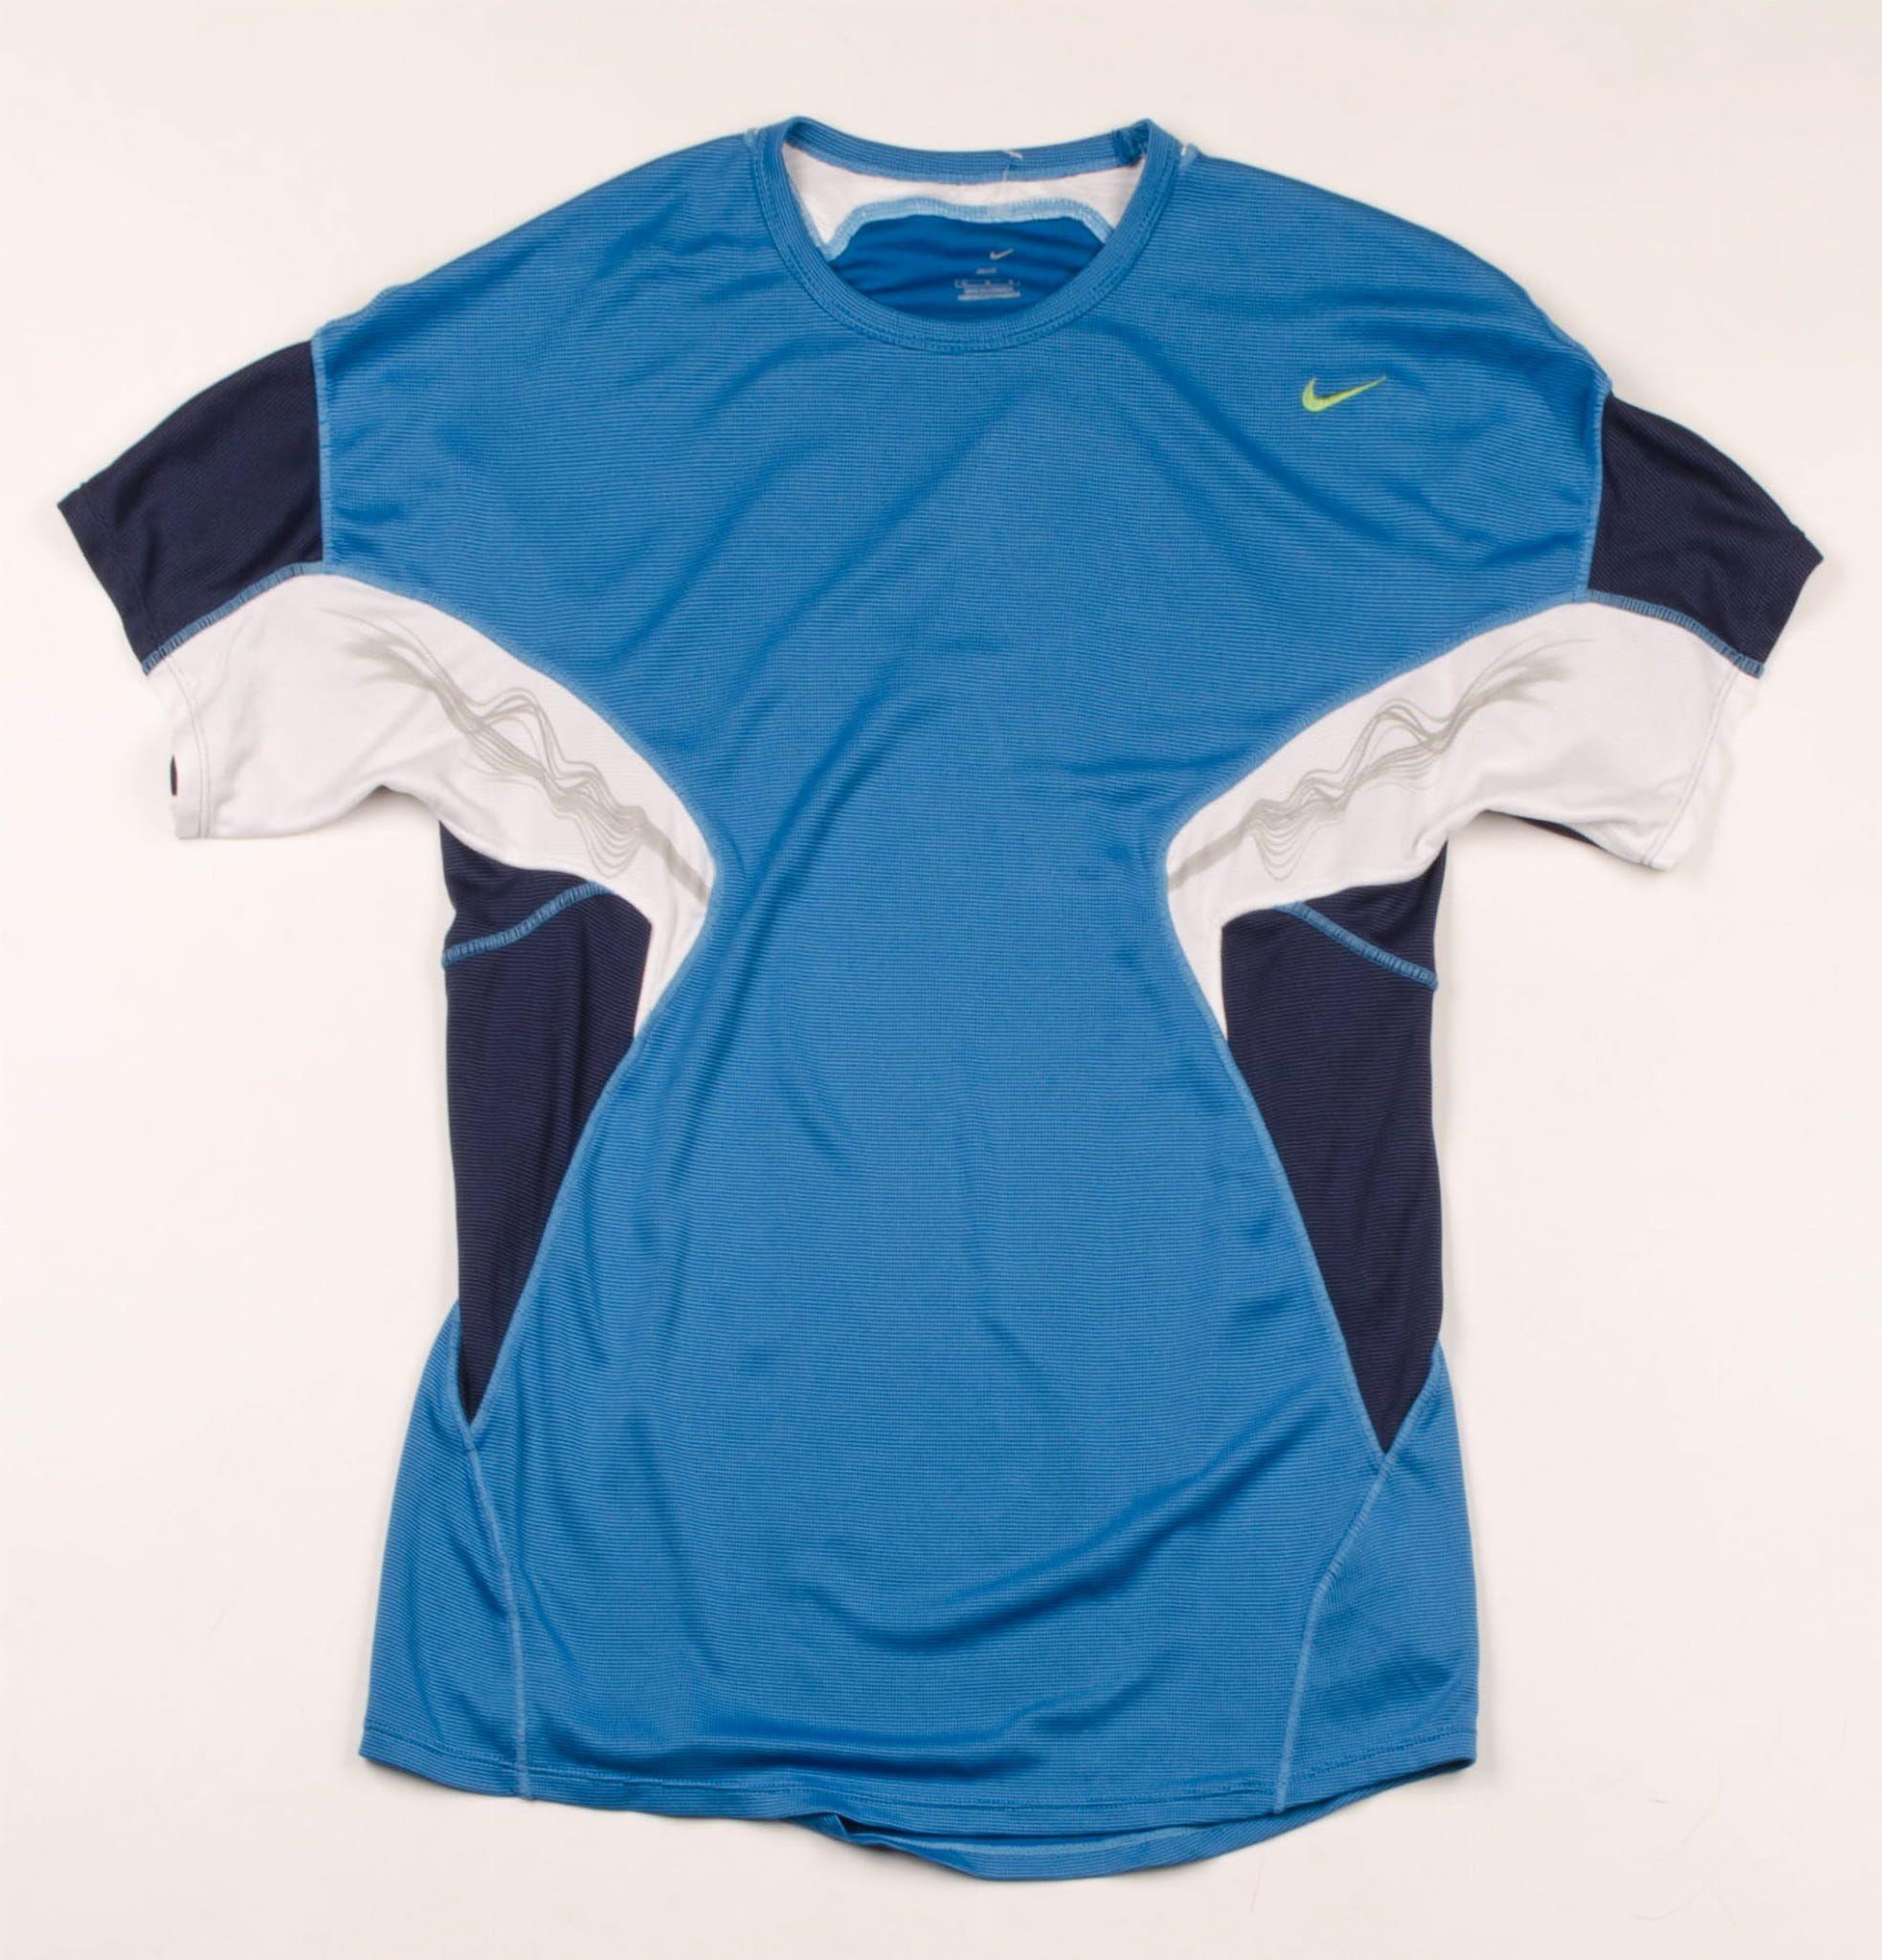 34287 Nike Koszulka Sportowa Męska M